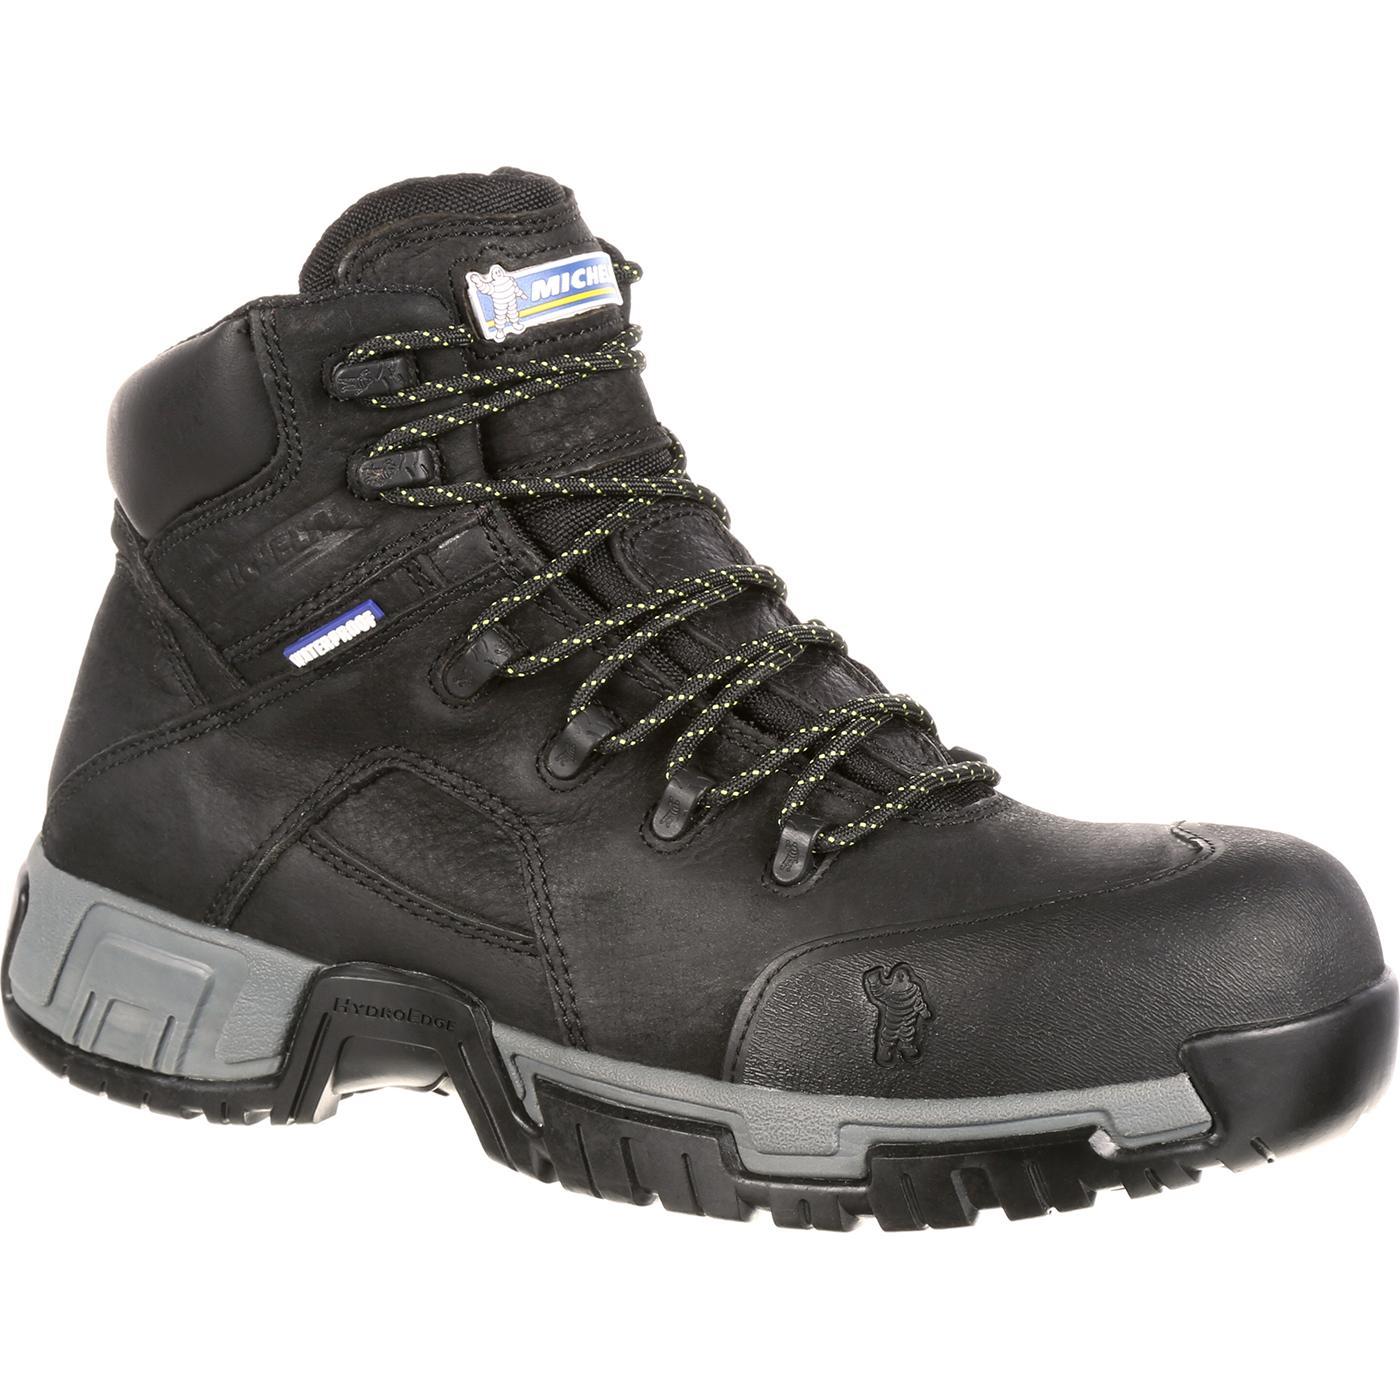 f079fb7cbb290f Michelin HydroEdge Steel Toe Puncture-Resistant Waterproof Work Boot